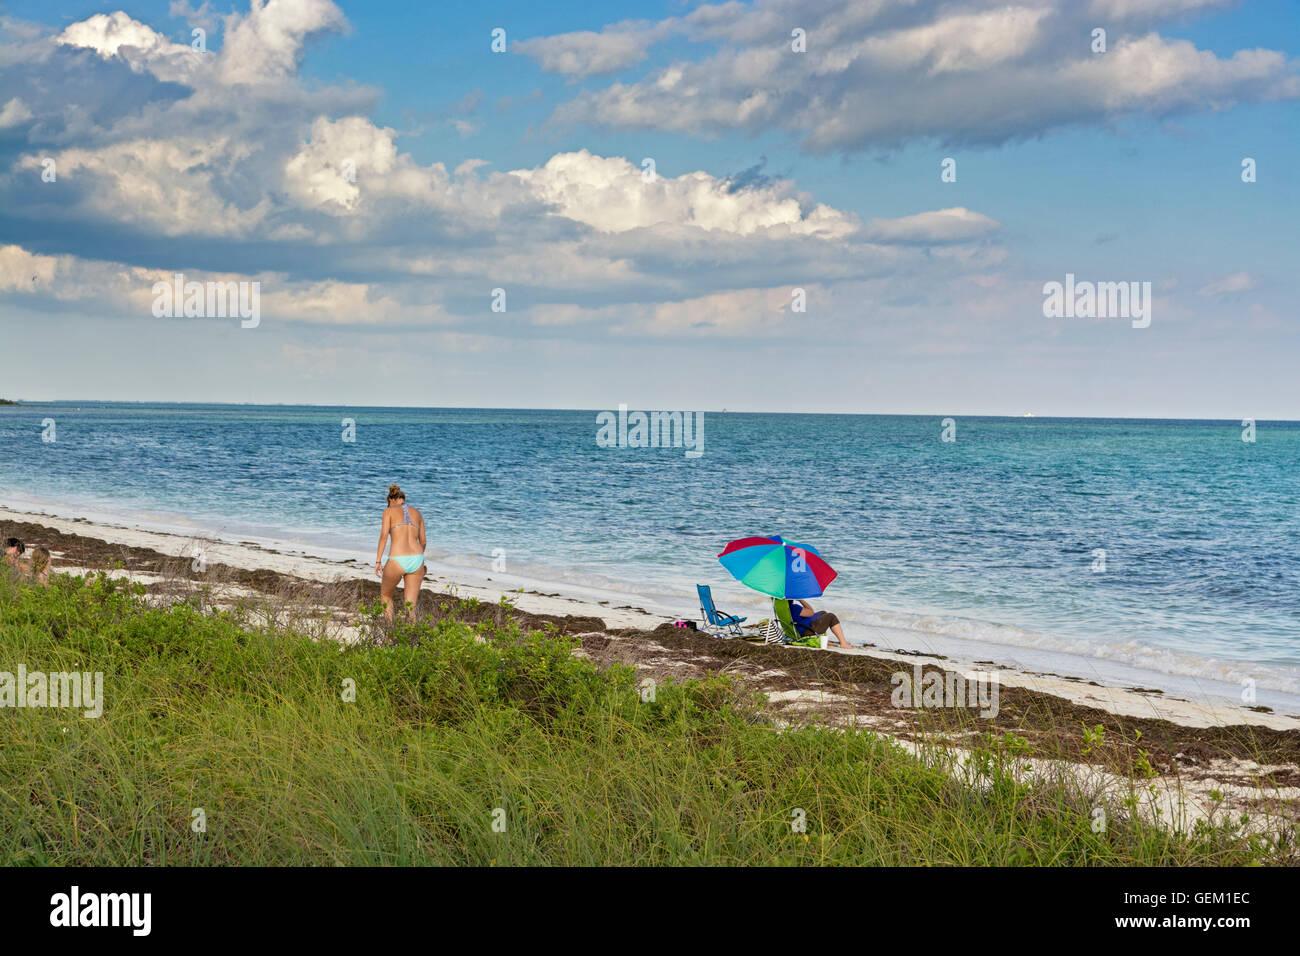 Florida Keys, Bahia Honda State Park, Seagrass on beach, umbrella, woman, bikini - Stock Image